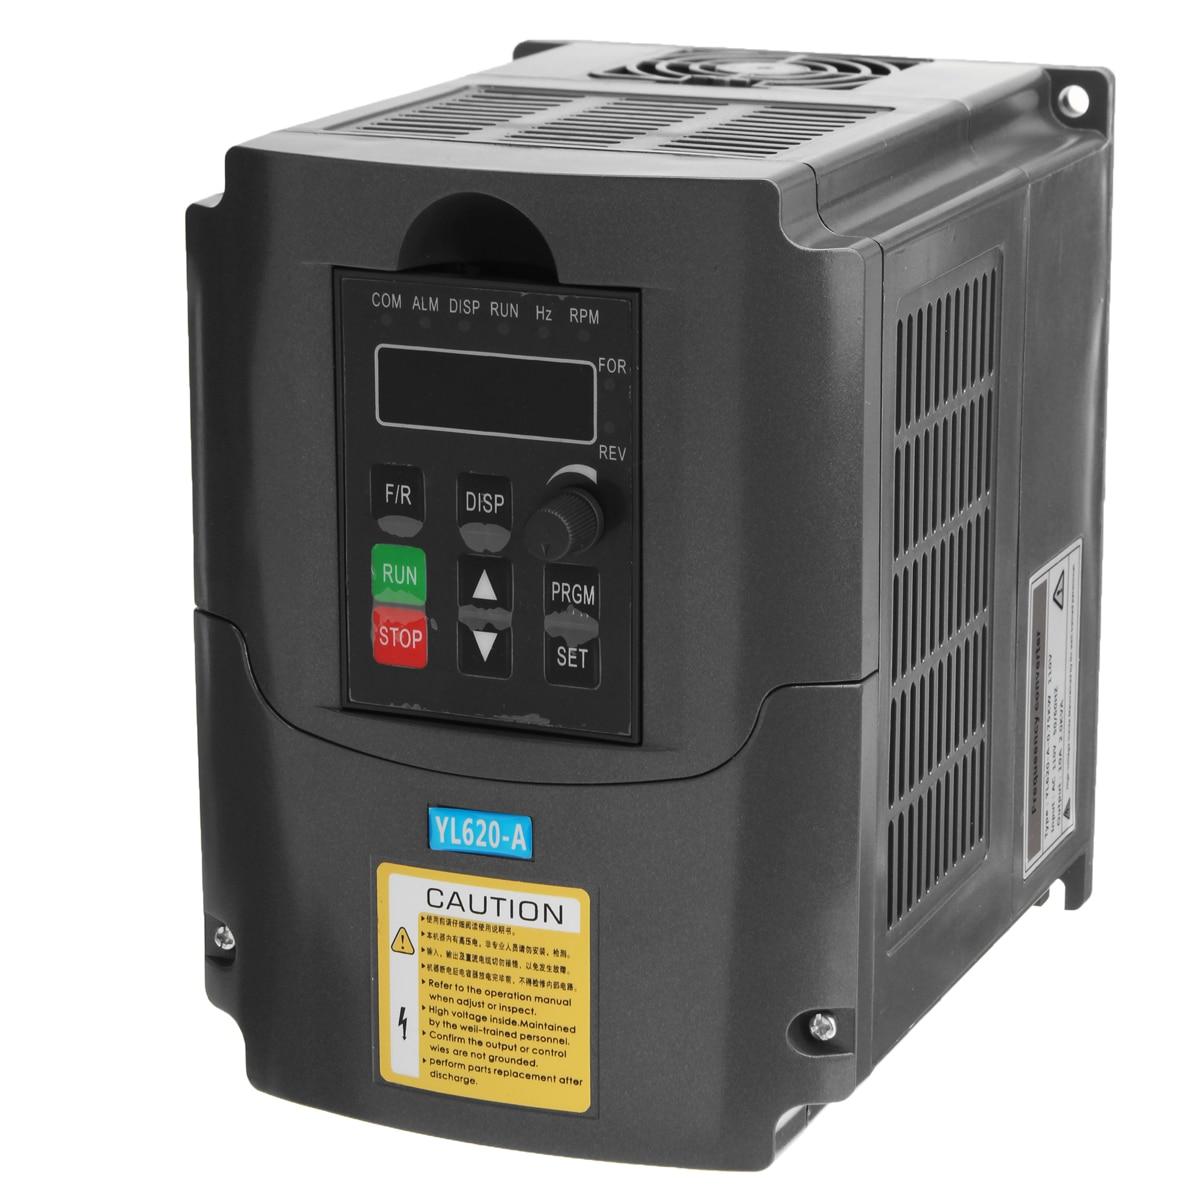 Здесь продается  AC Variable Frequency Inverter Converter 0.75KW 110V 3 Phase Output Built-in PLC Single Phase Space Voltage Vector Modulation  Электротехническое оборудование и материалы